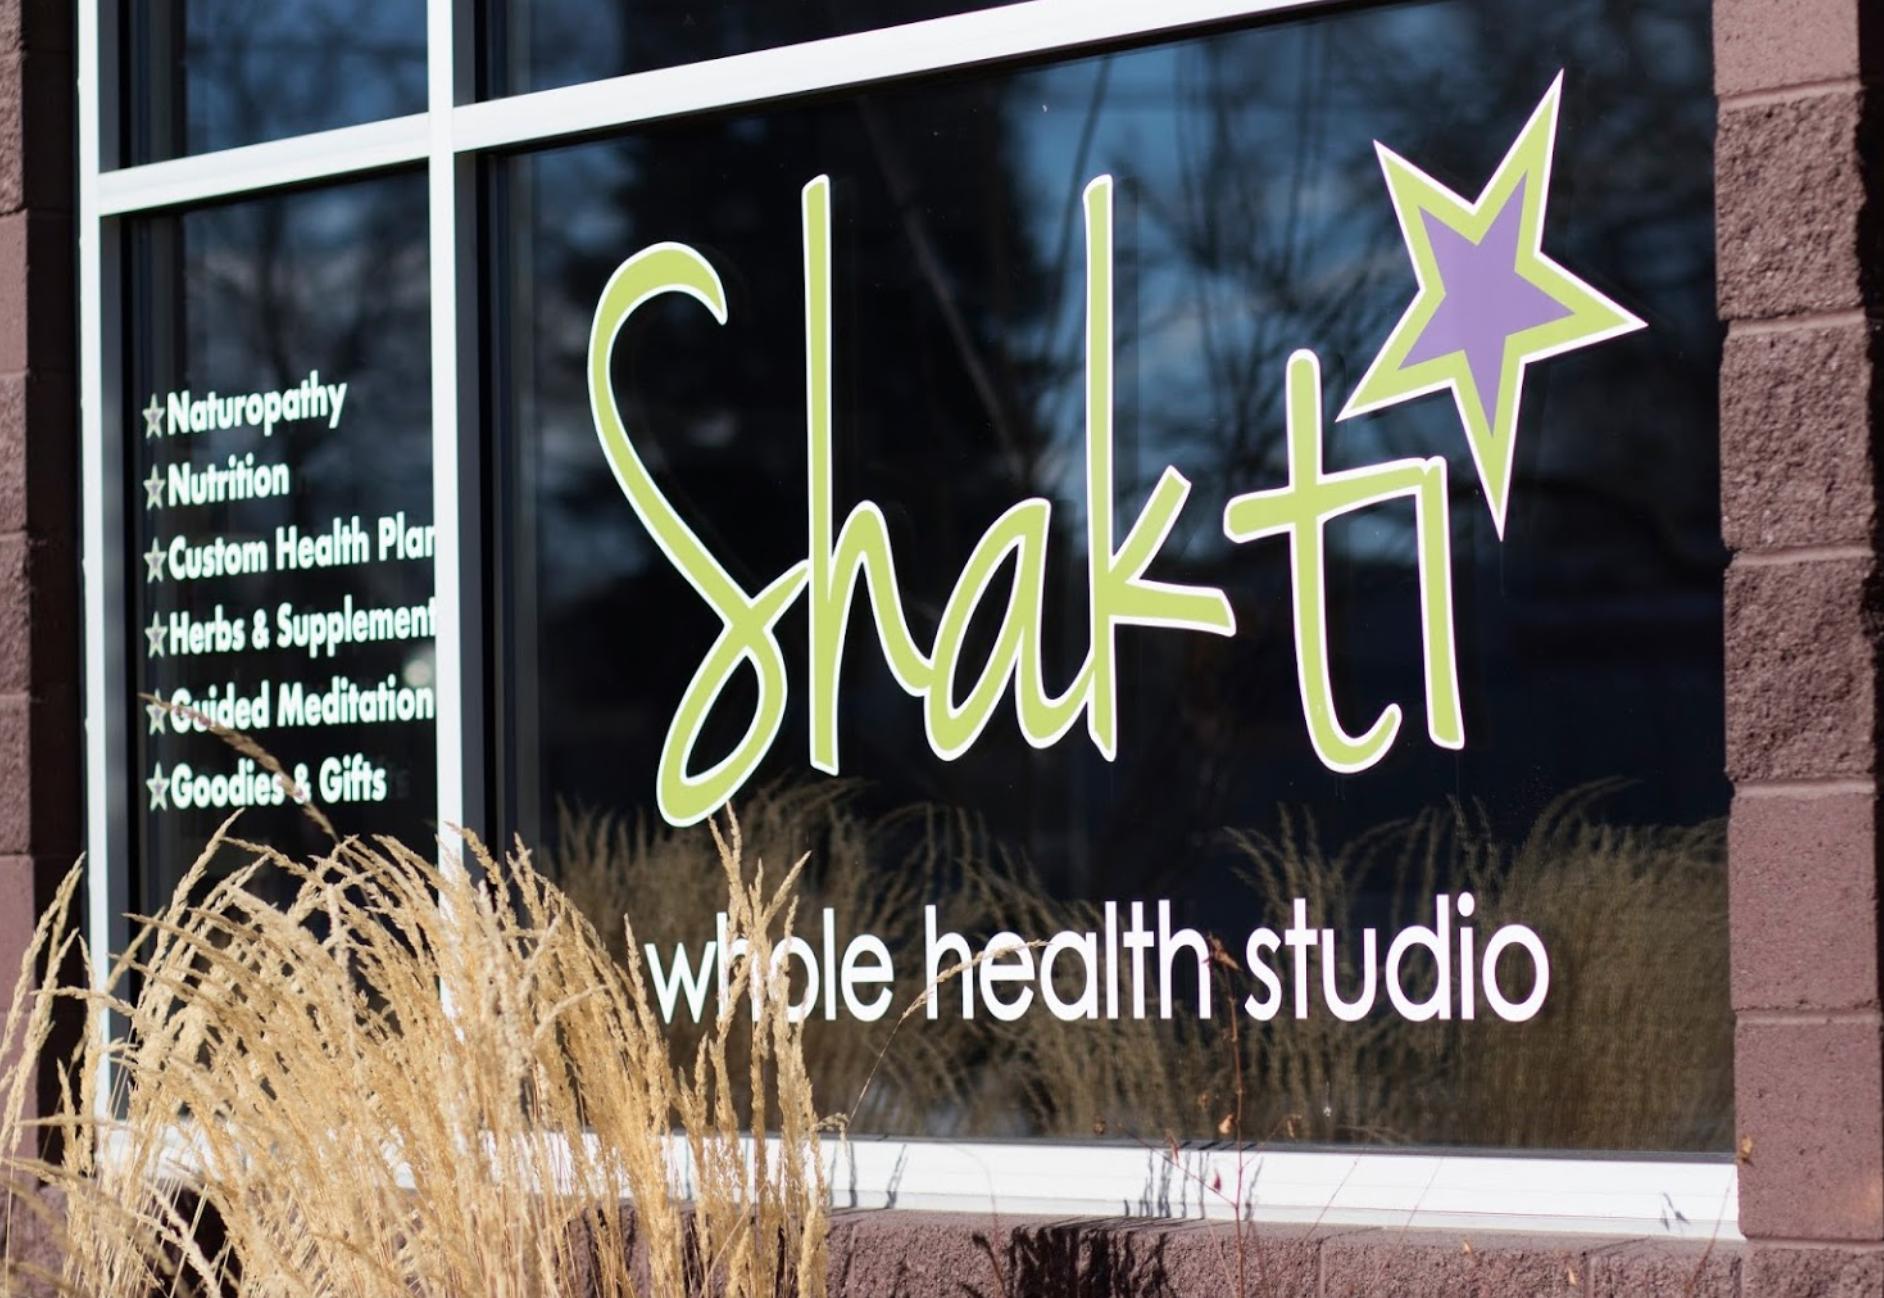 Shakti Whole Health Studio